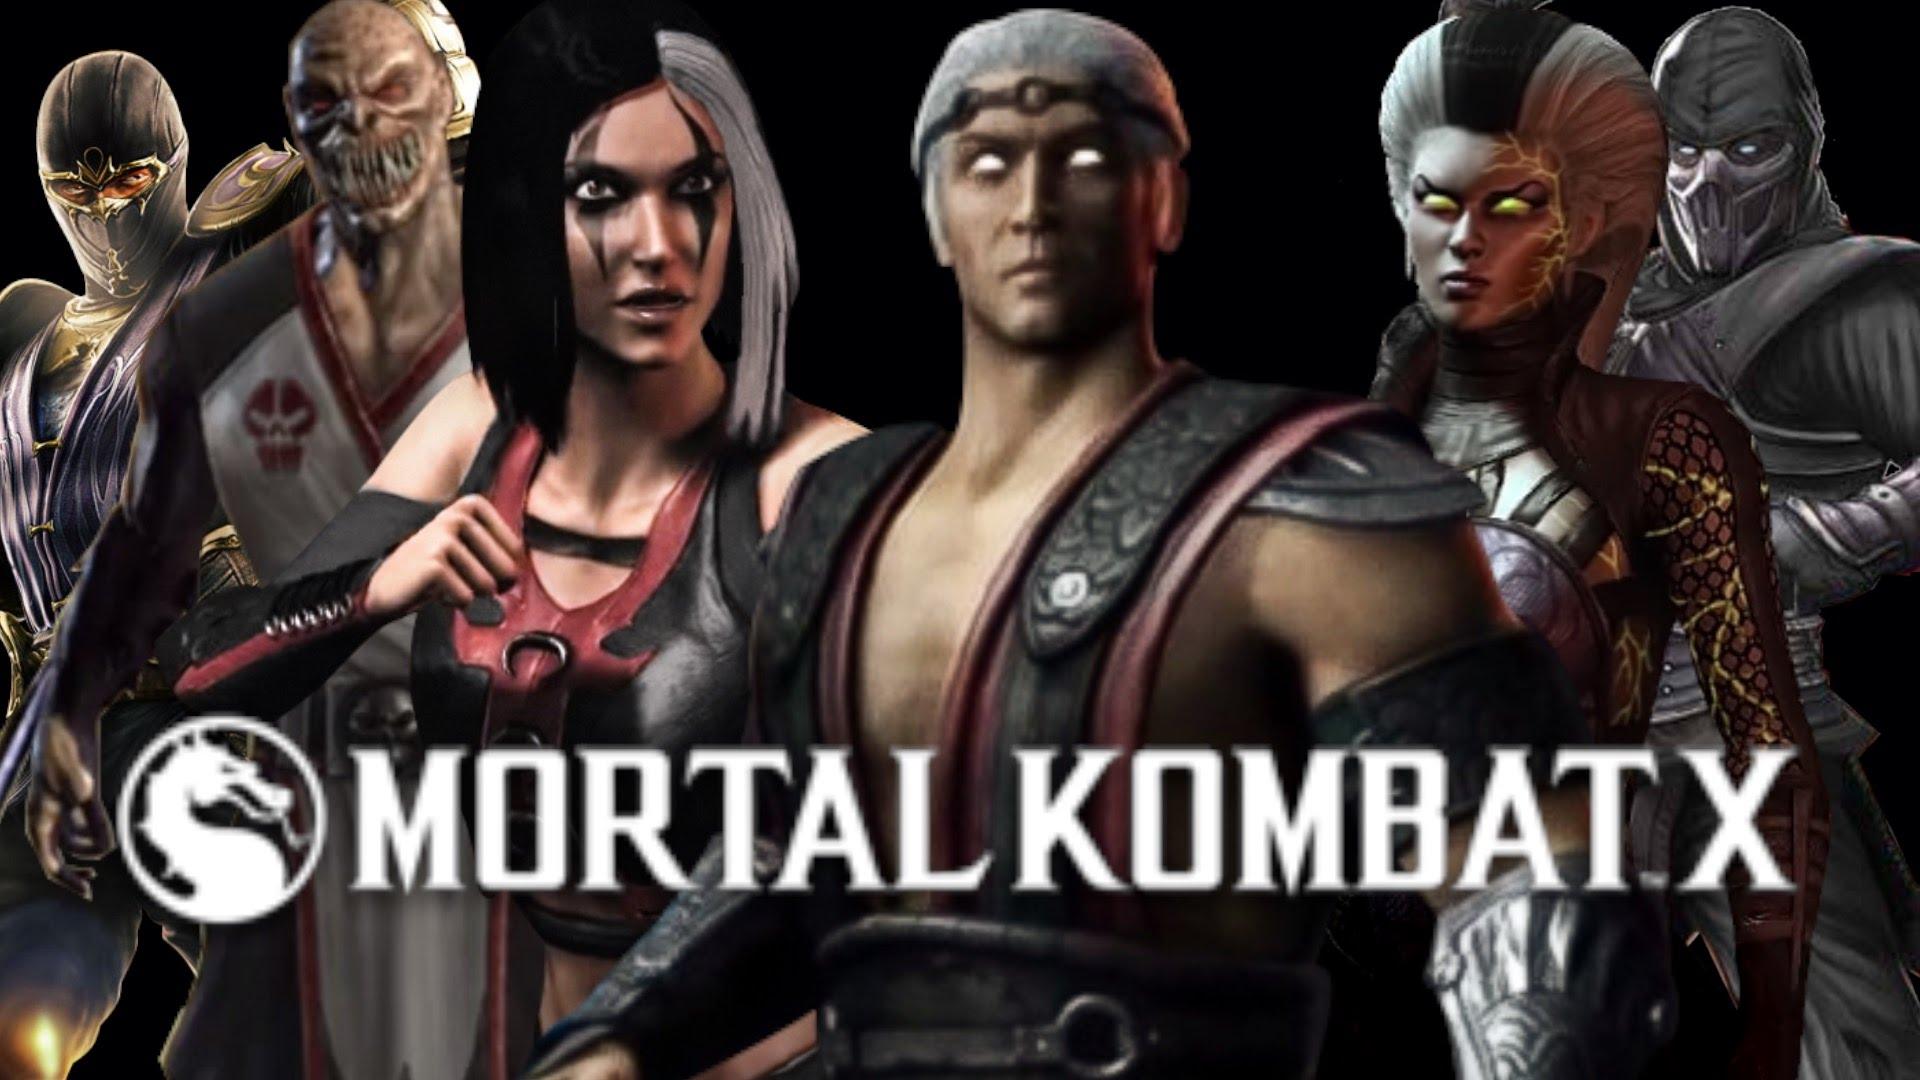 Mortal Kombat X News: Kombat Pack 2 DLC